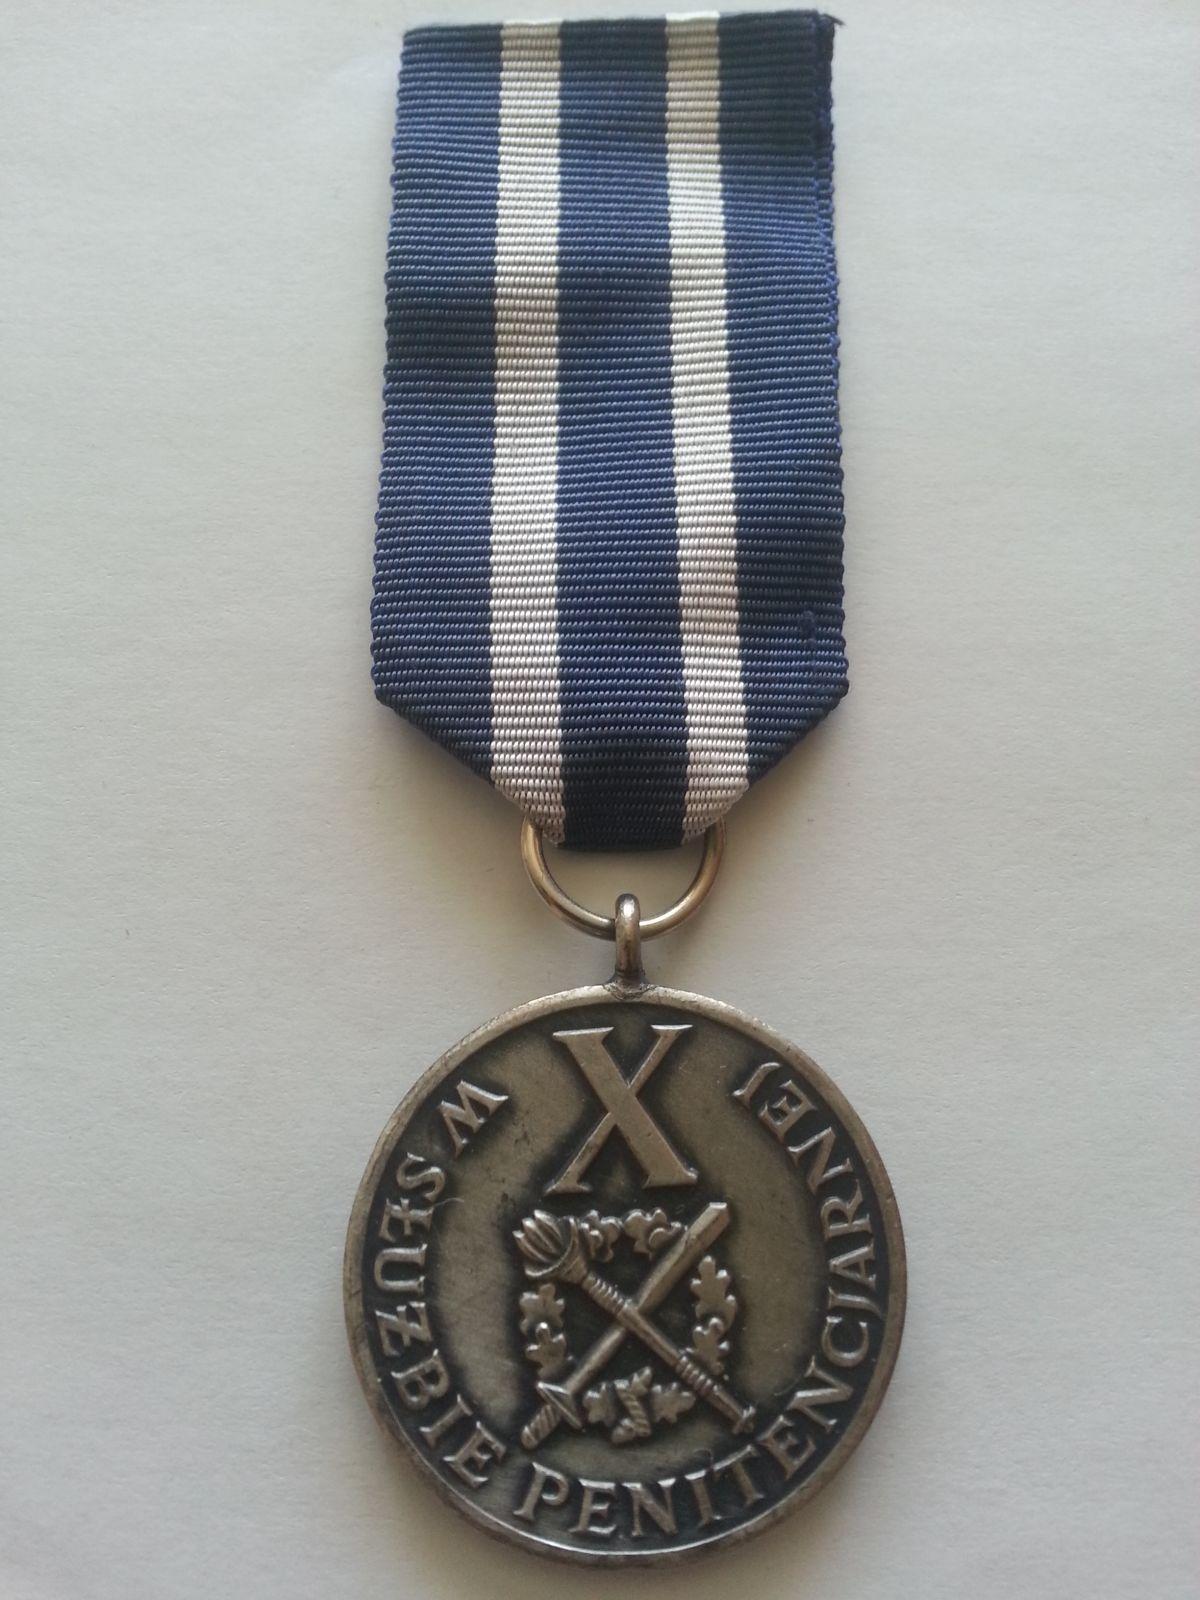 za X. let vojenské služby, Polsko